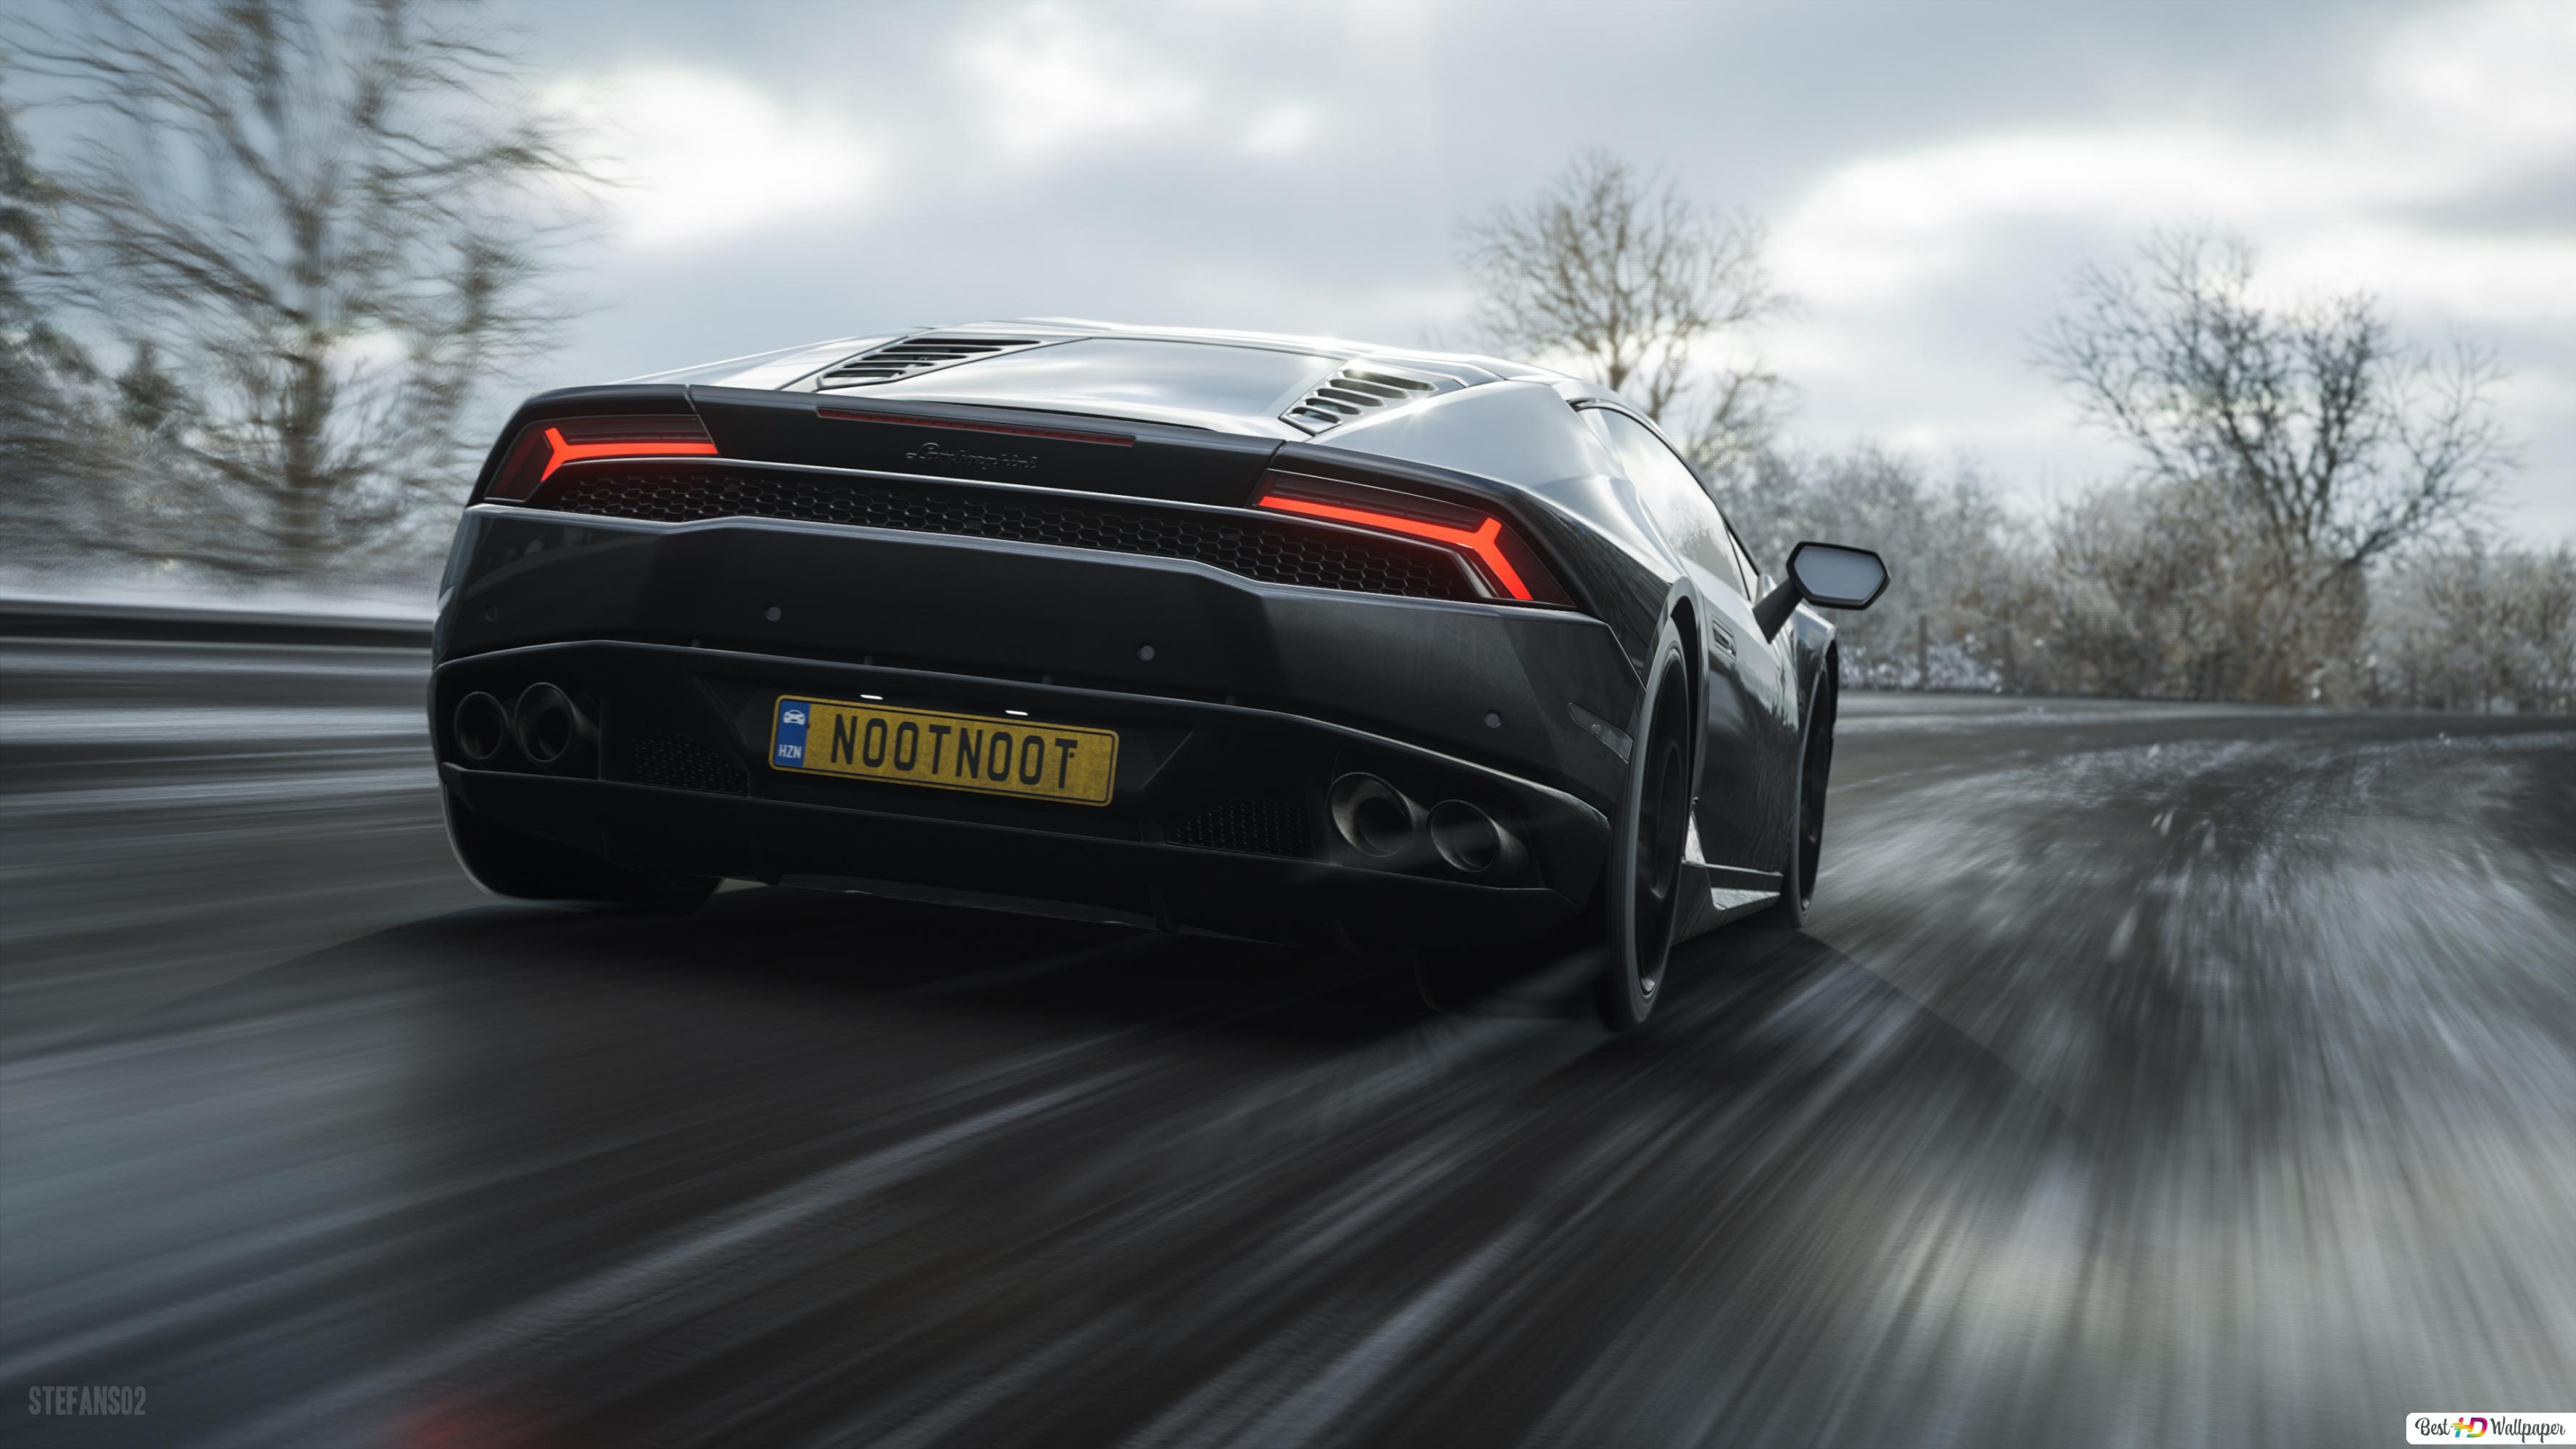 Forza Horizon 4 Game Lamborghini Huracan Hd Wallpaper Download